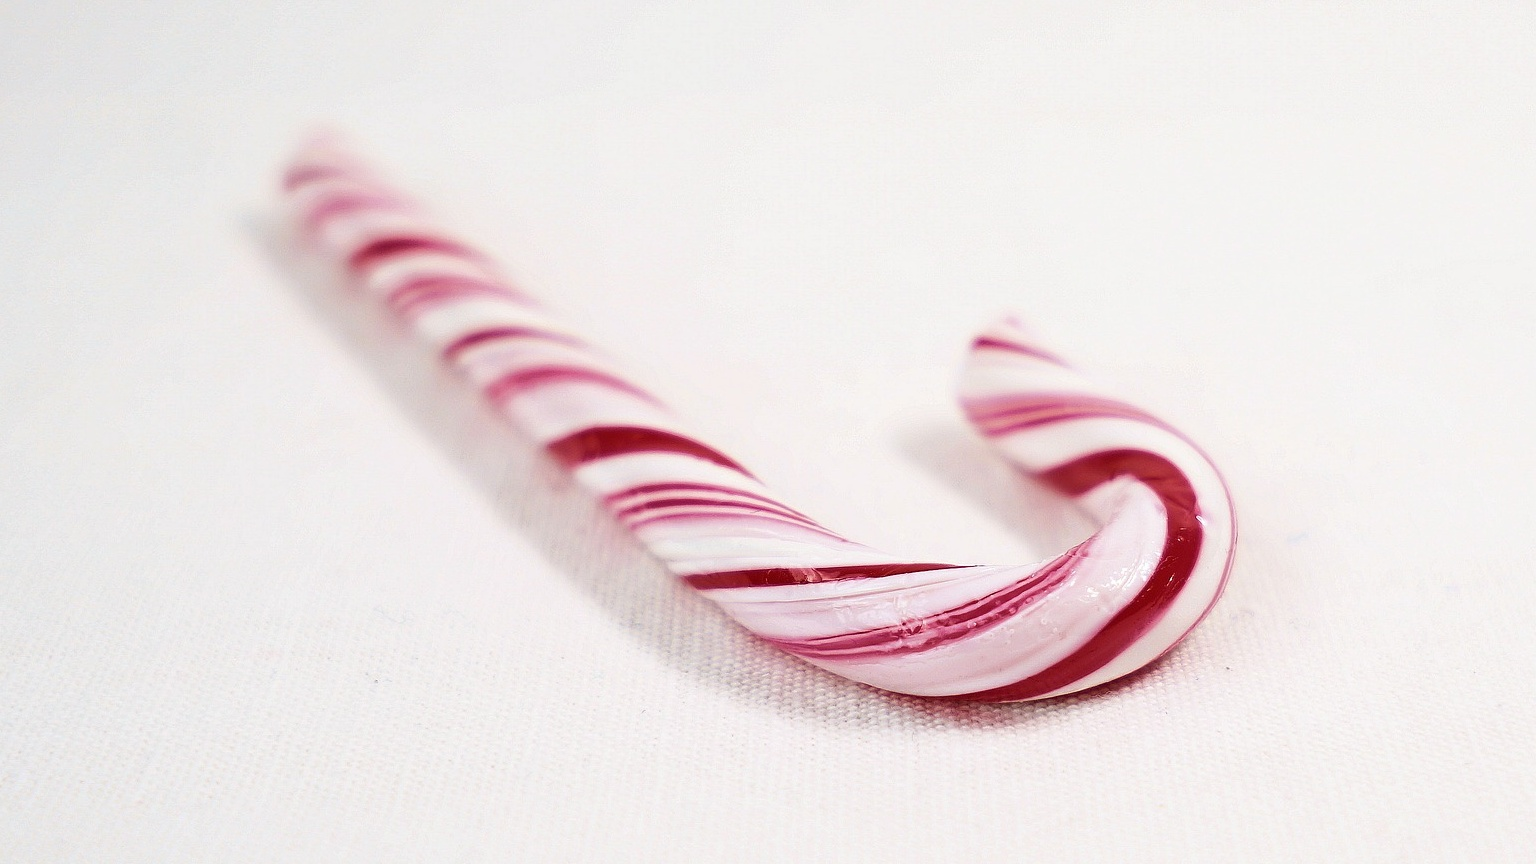 candy-cane-2934457_1920 Cropped_1538131445819.jpg.jpg